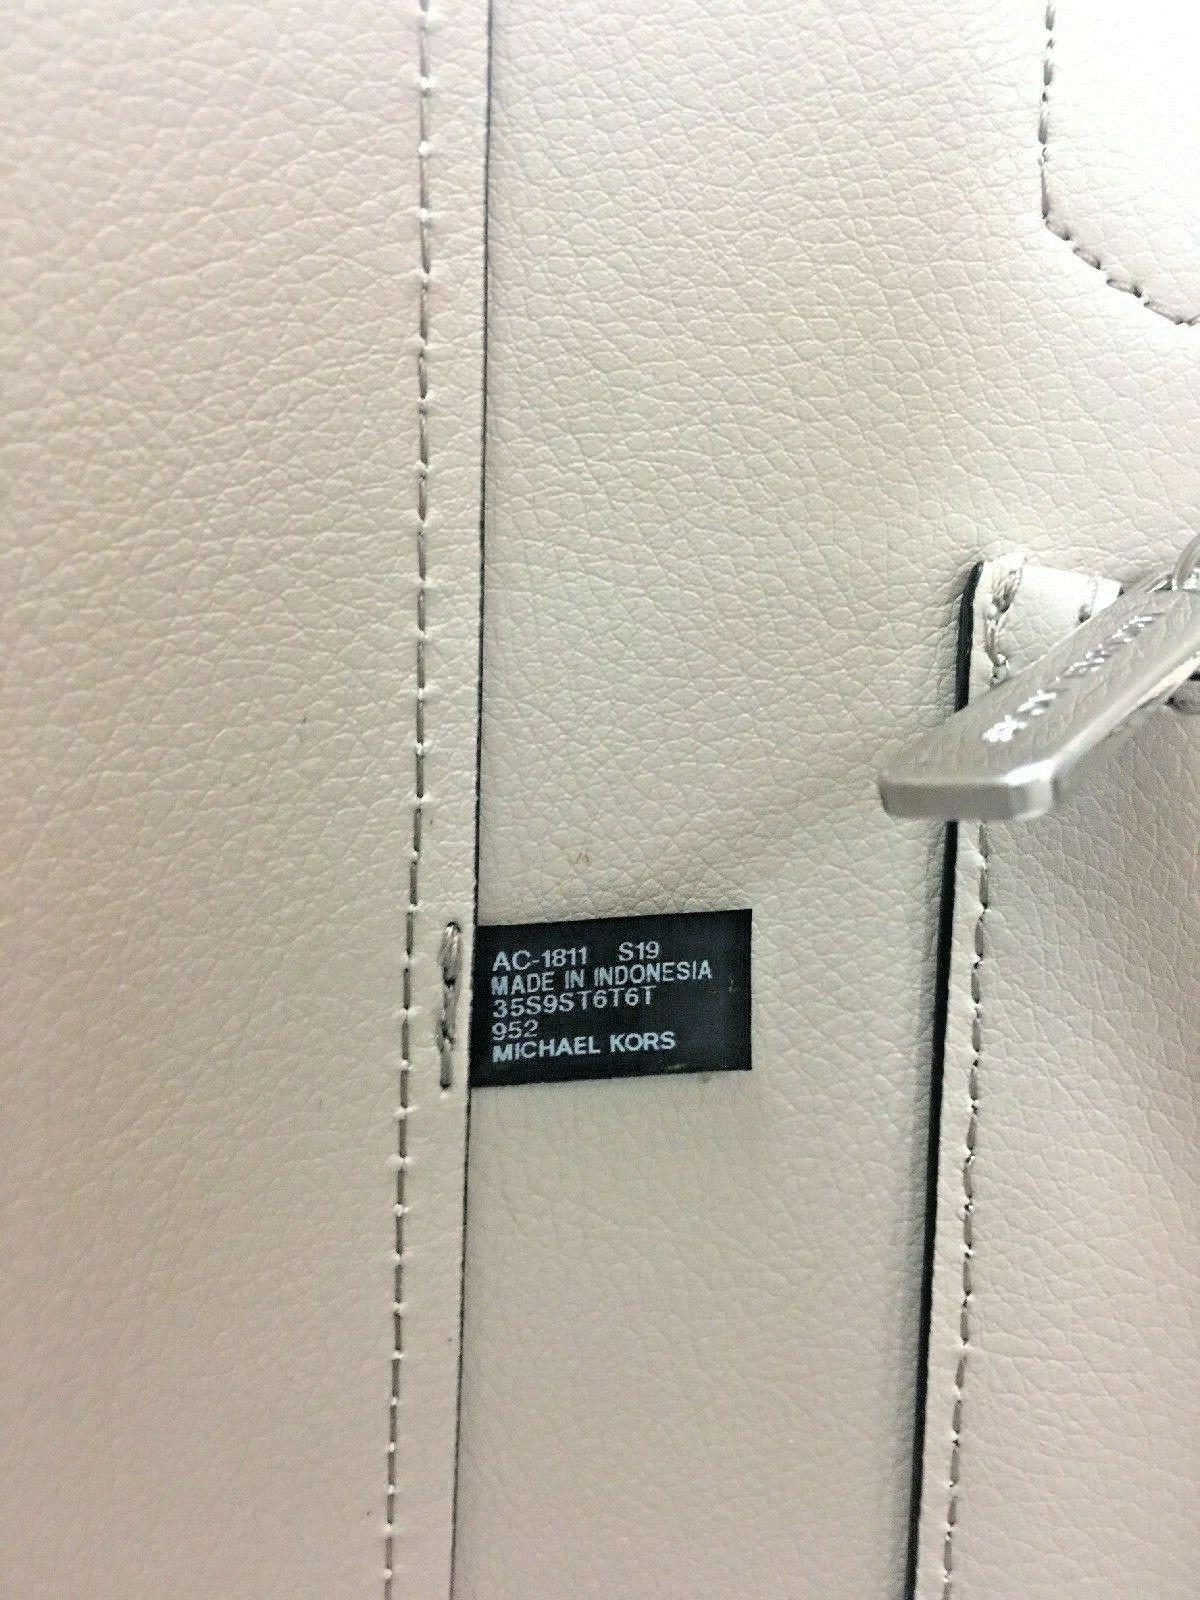 Michael Kors Bag Cassie Tote Medium NS Tote Leather White Gray Black B2R image 11